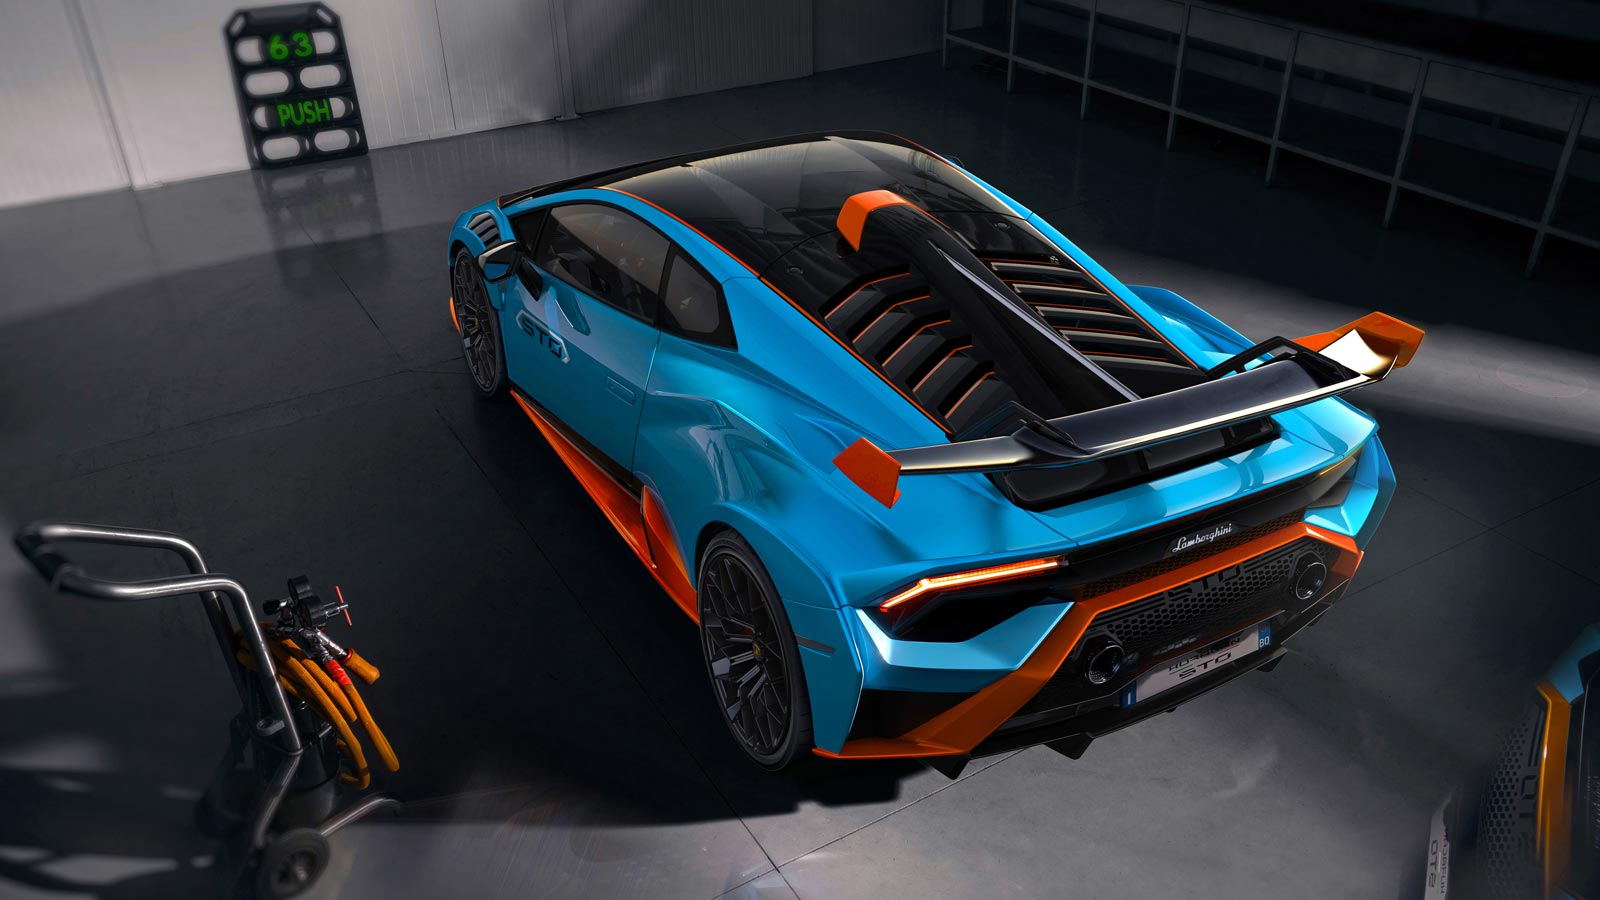 Lamborghini Huracan STO - From racetrack to road image 7